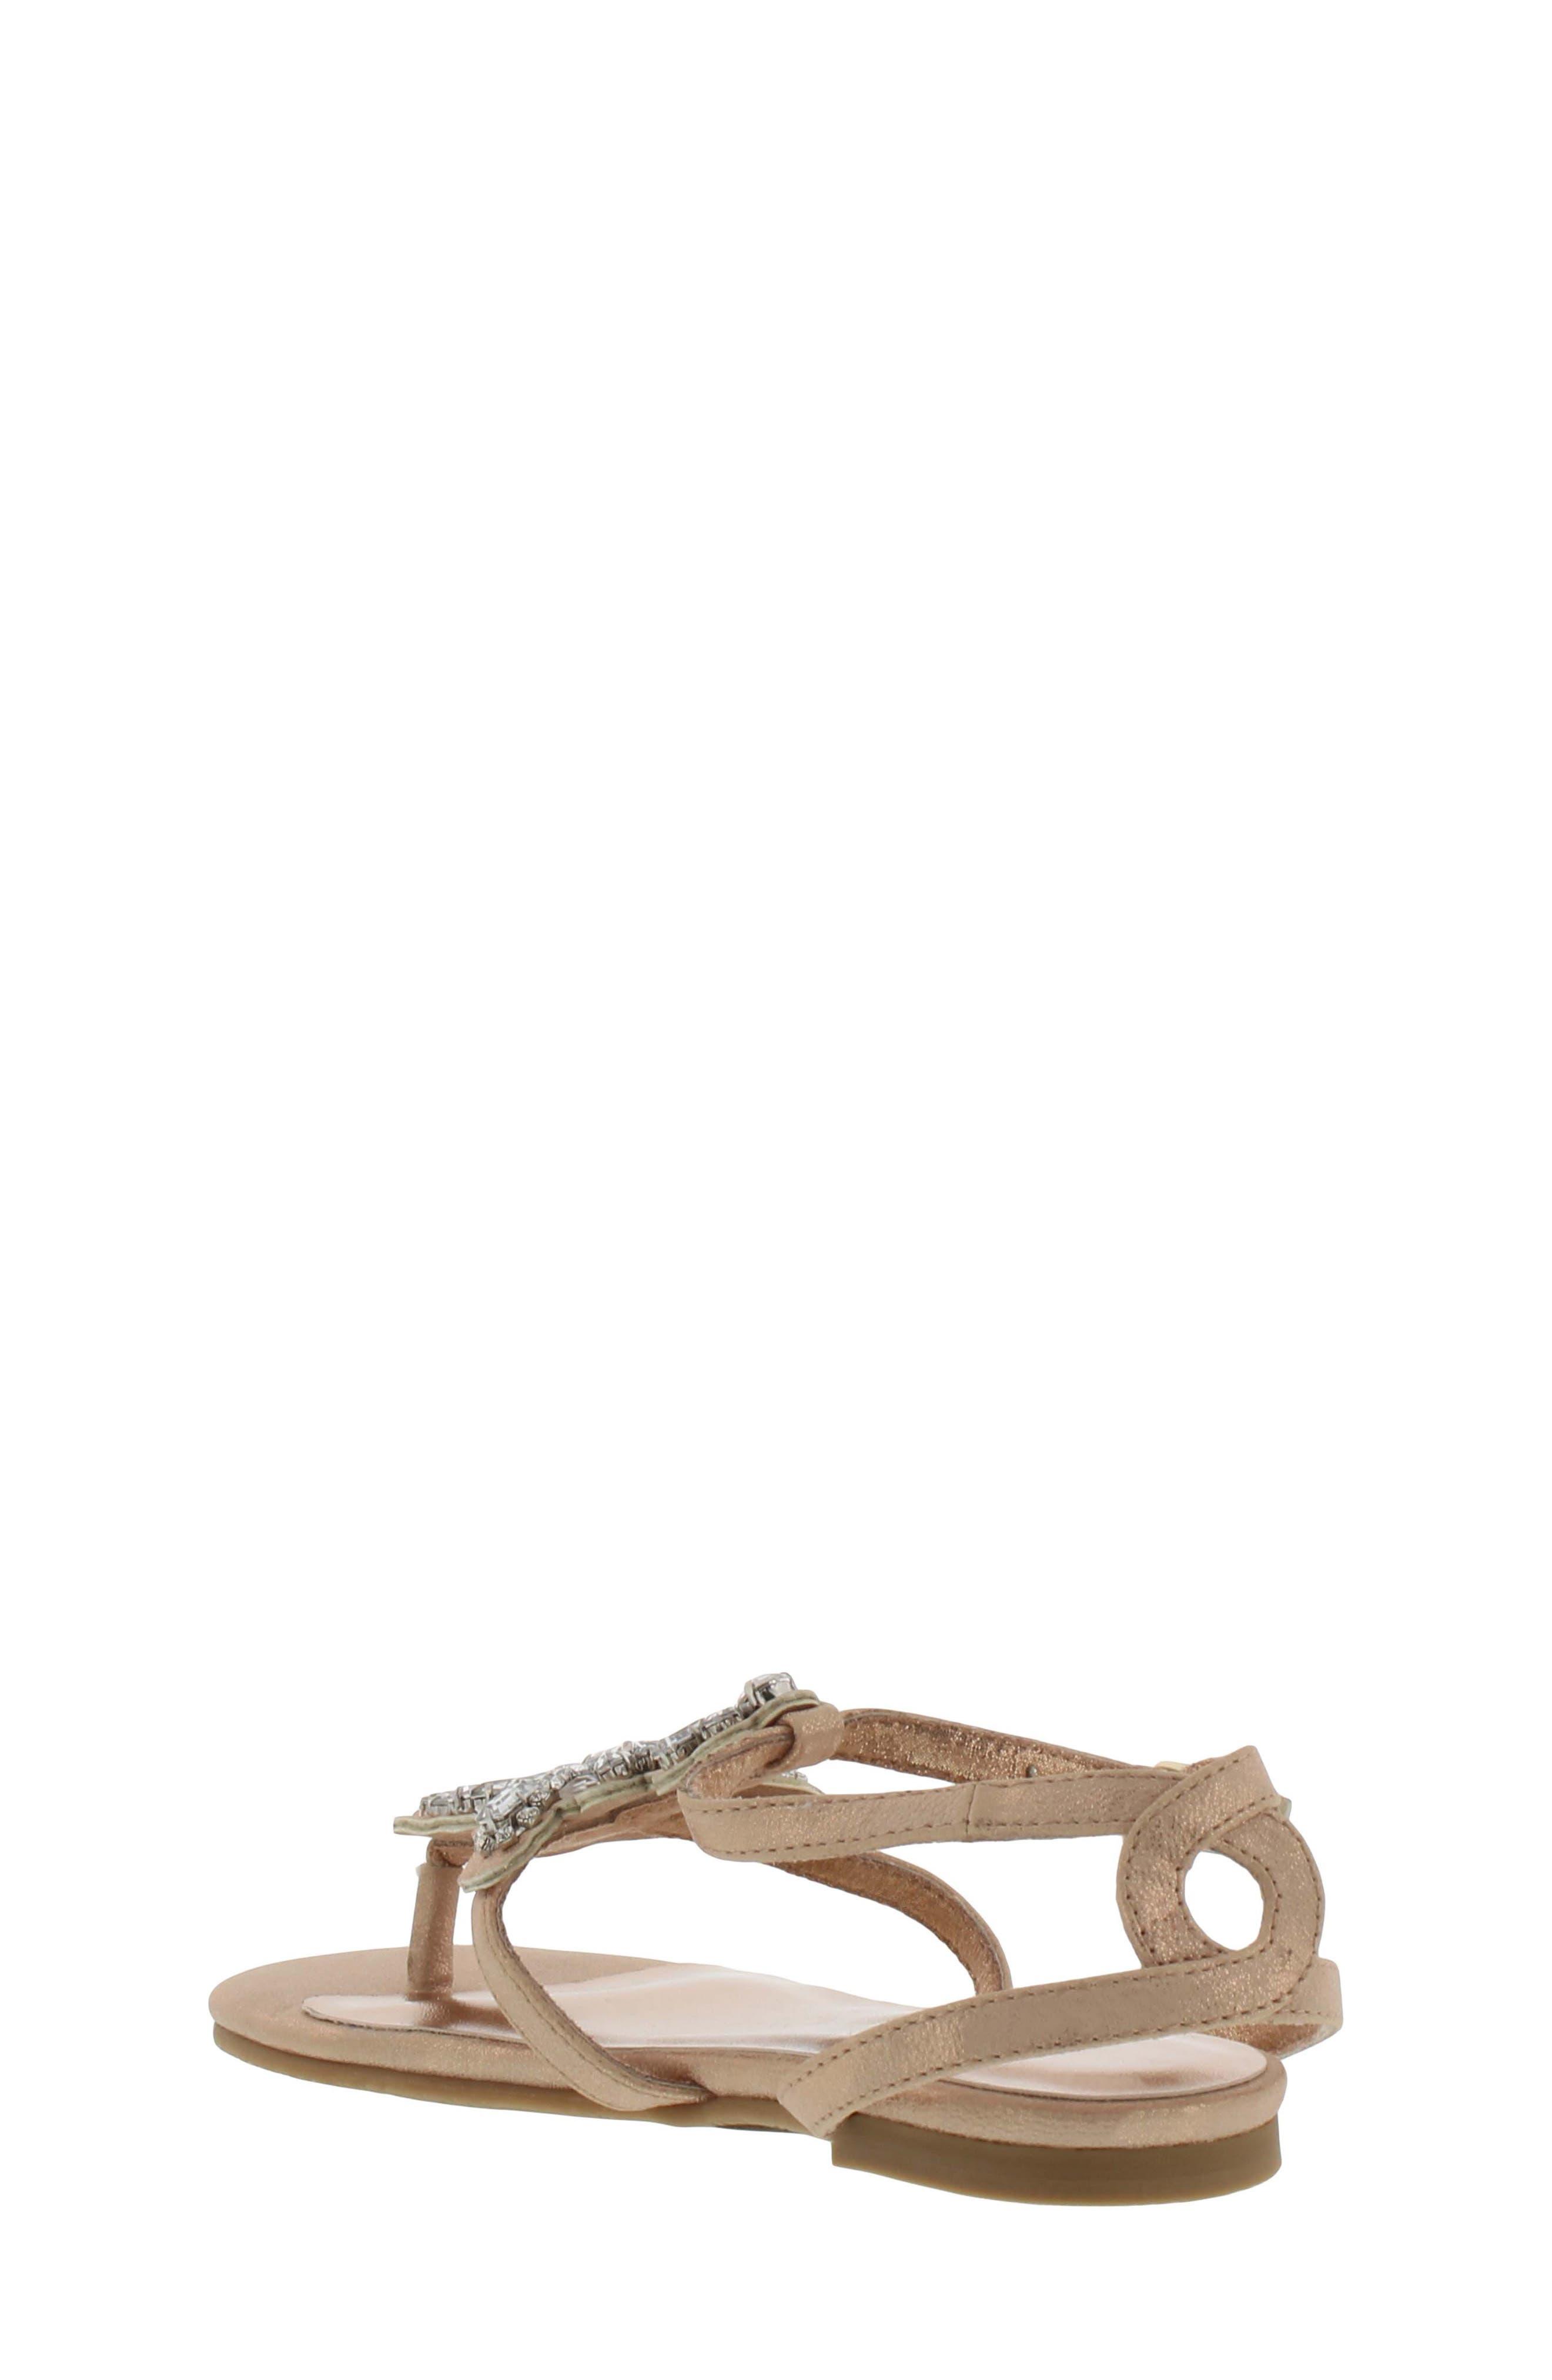 Cara Barstow Embellished Sandal,                             Alternate thumbnail 4, color,